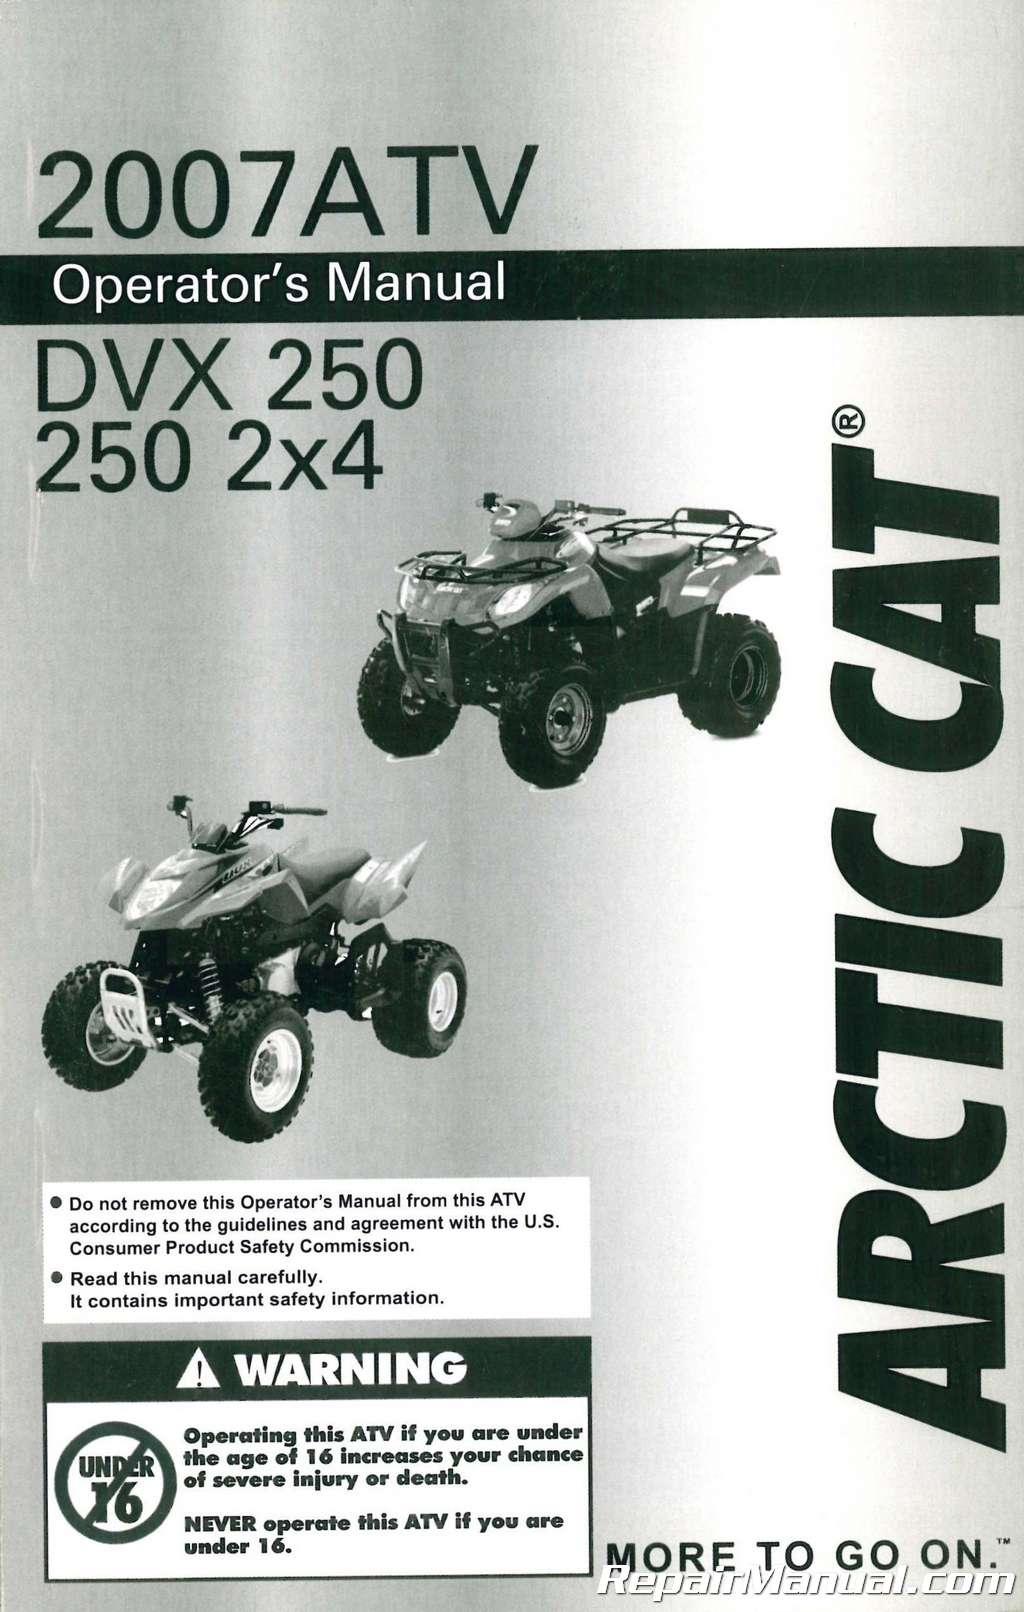 2007 Arctic Cat 250 Dvx 2 215 4 Owners Manual border=